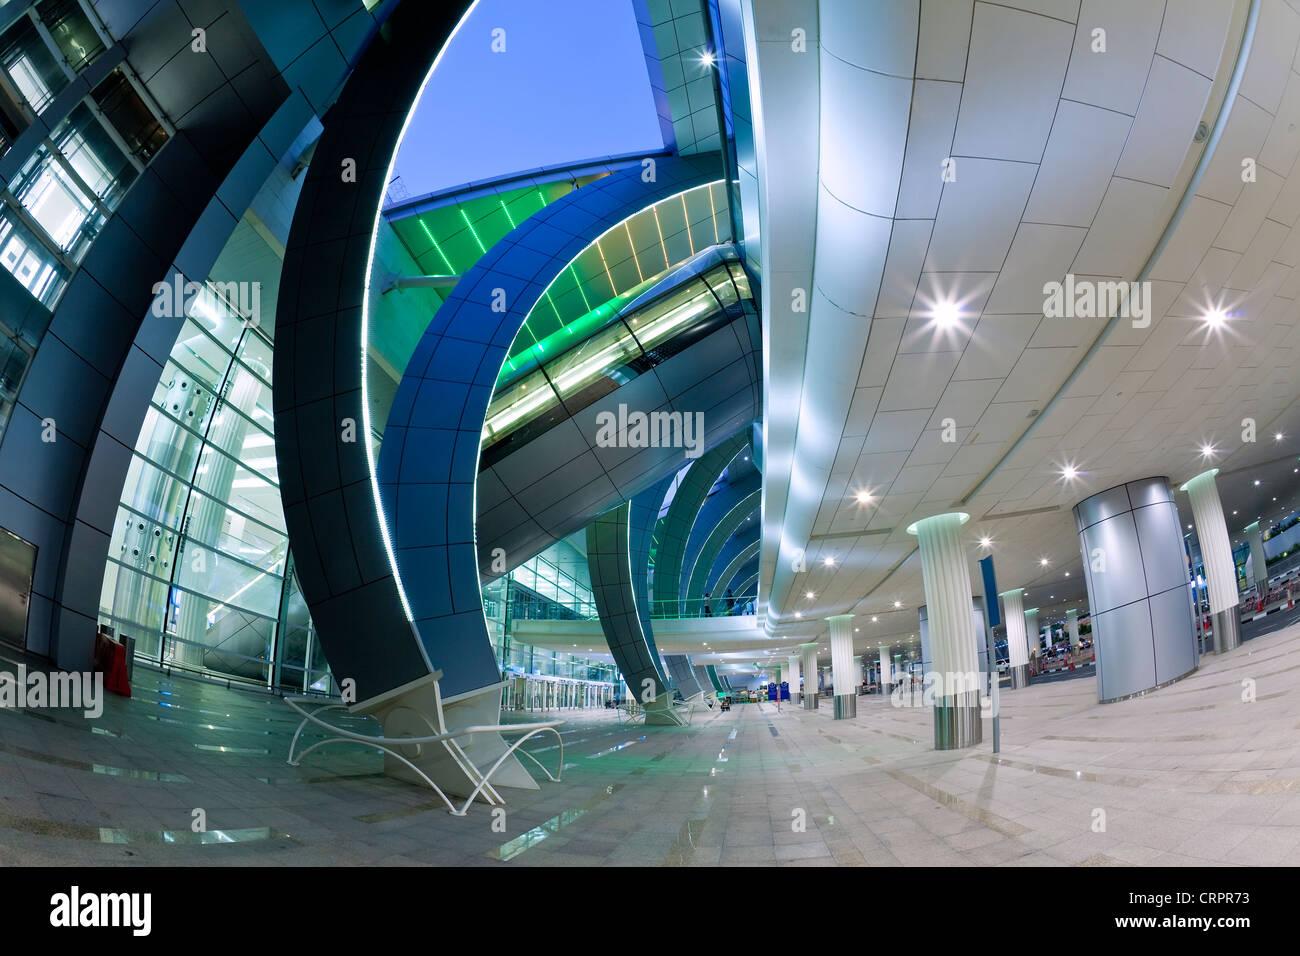 Stylish modern architecture of the 2010 opened Terminal 3 of Dubai International Airport, Dubai, UAE, United Arab - Stock Image